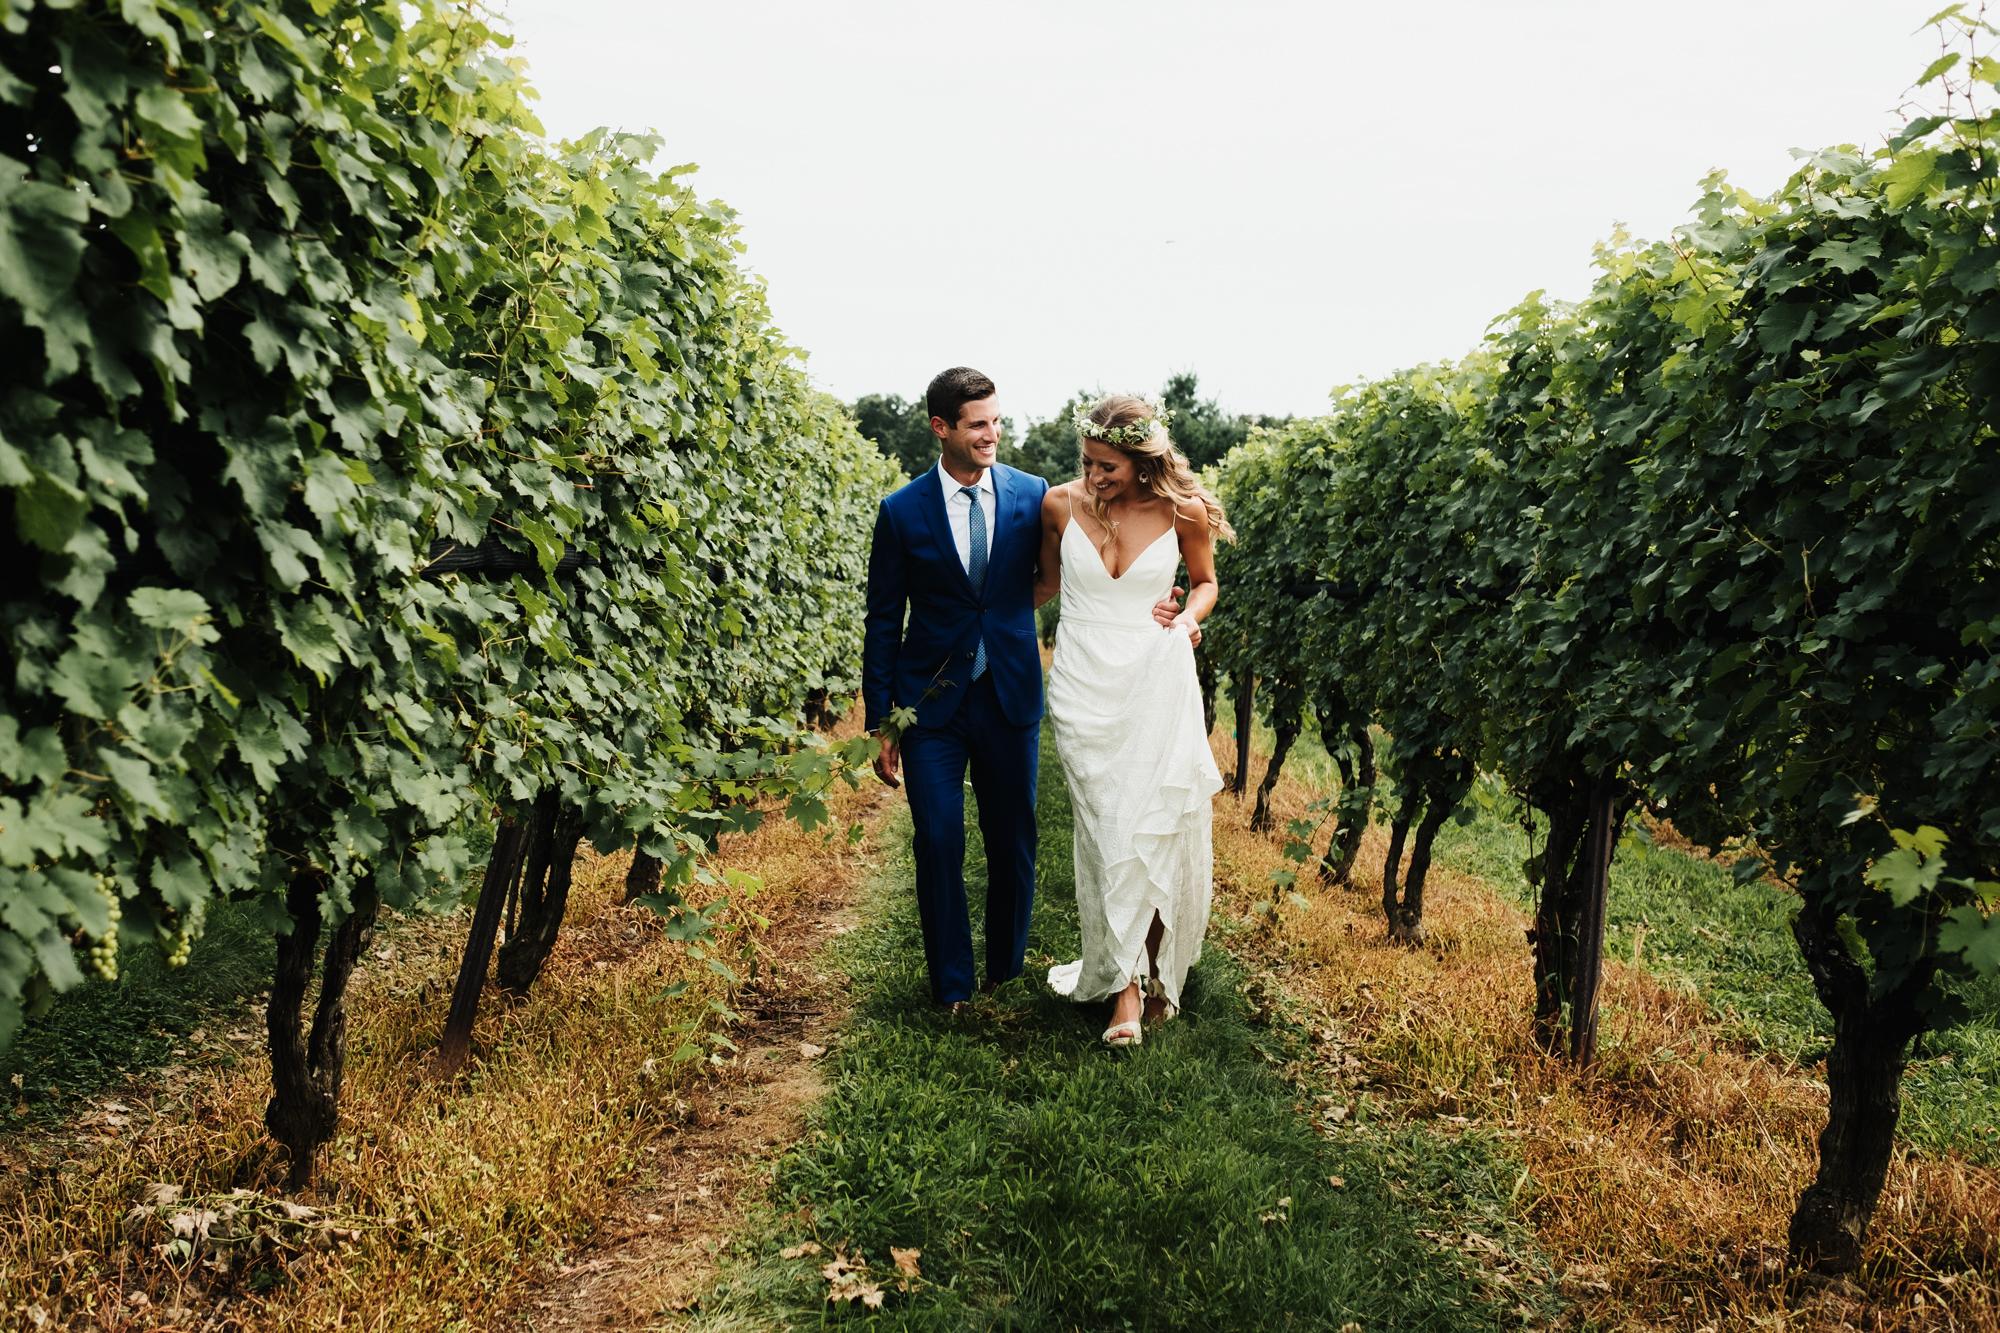 Wedding_Francis_Boucher_Jonathan_Edwards_Winery_2018-29.jpg